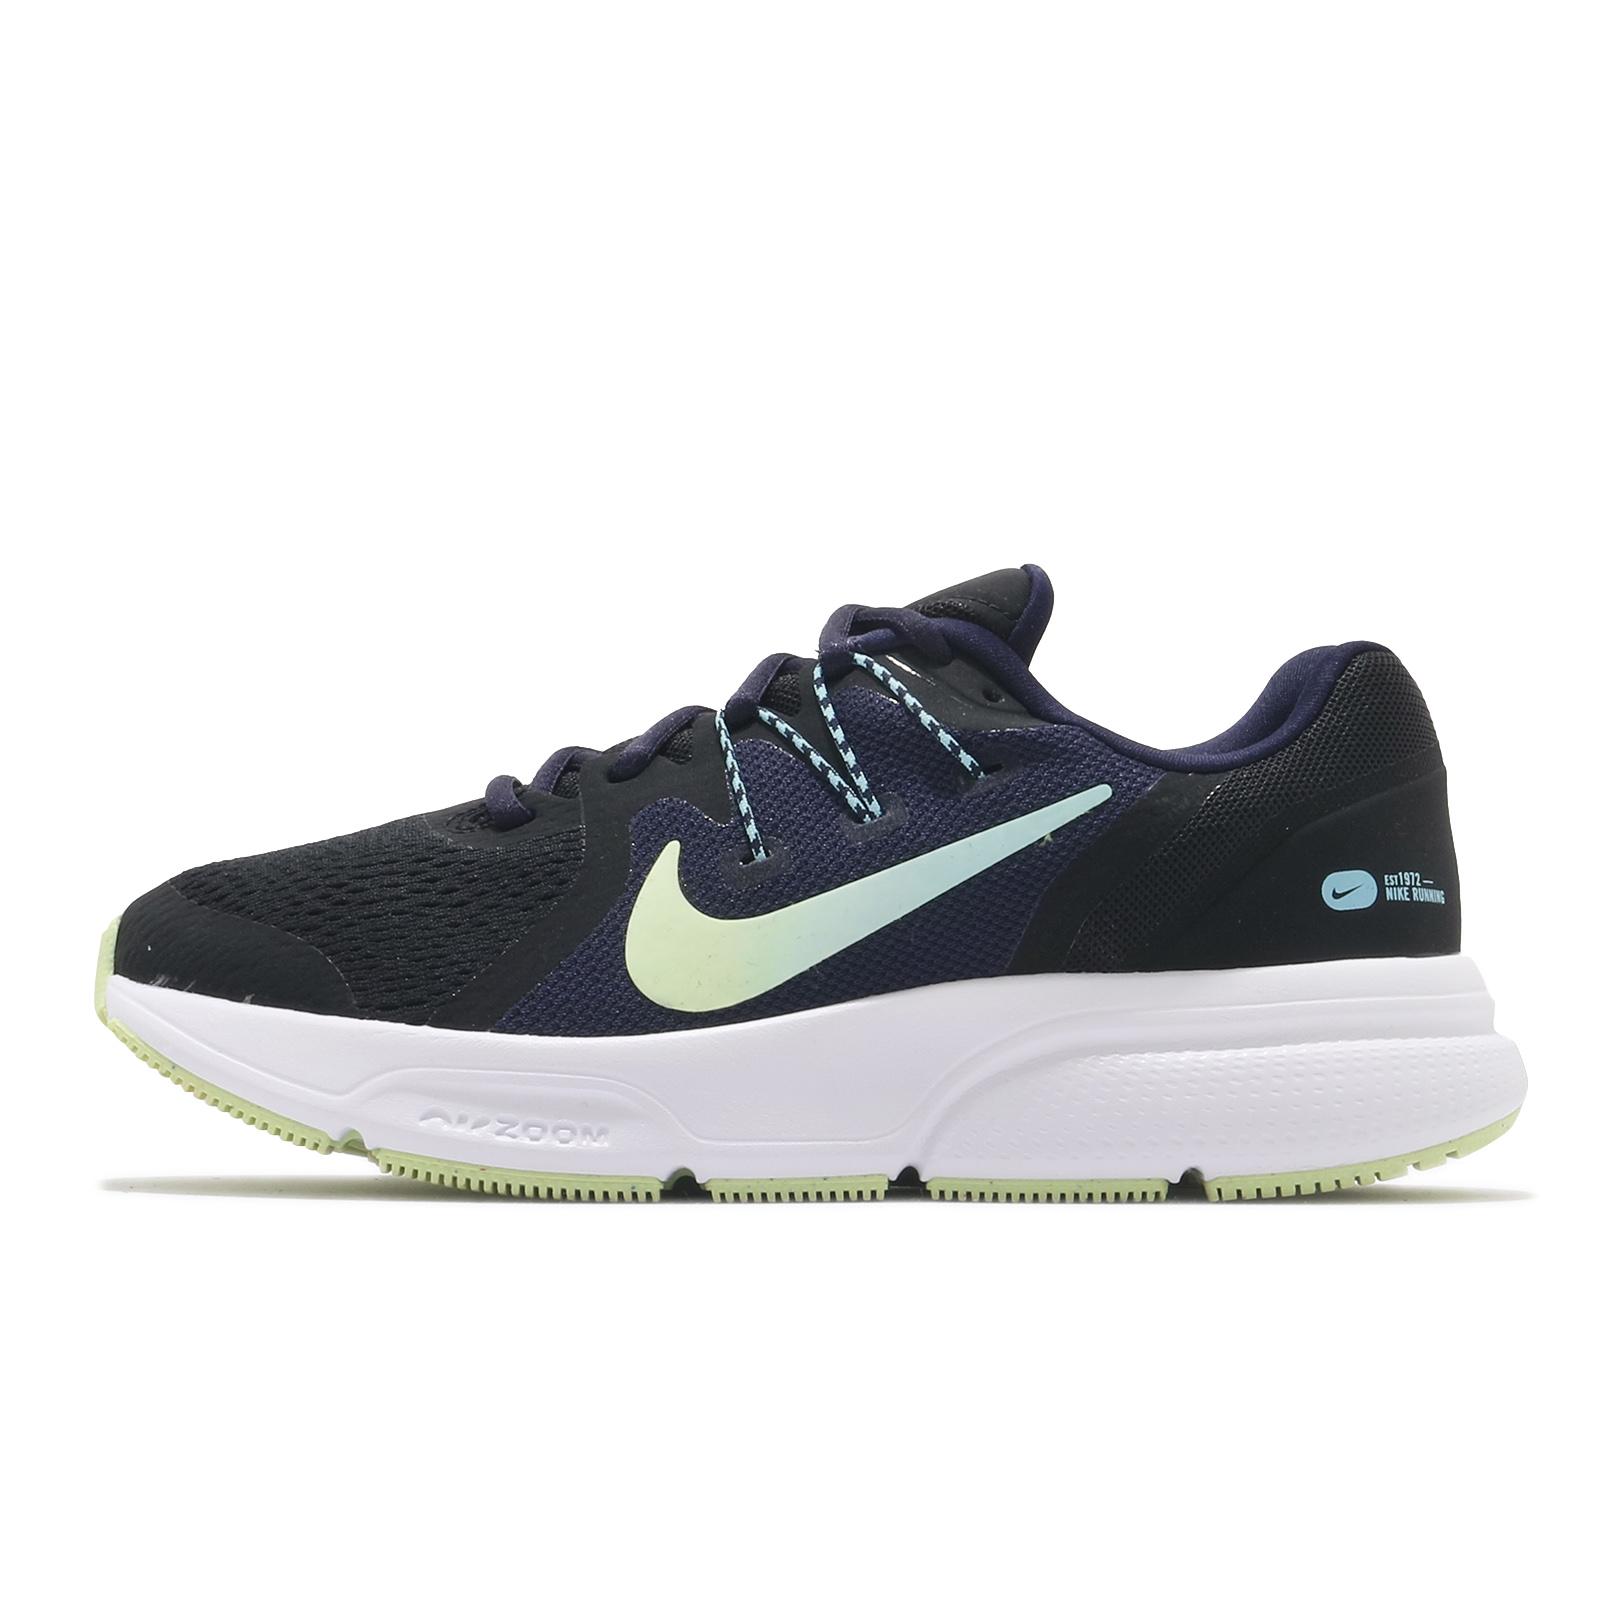 Nike 慢跑鞋 Wmns Zoom Span 3 黑 深藍 綠 漸層勾勾 女鞋【ACS】 CQ9267-013